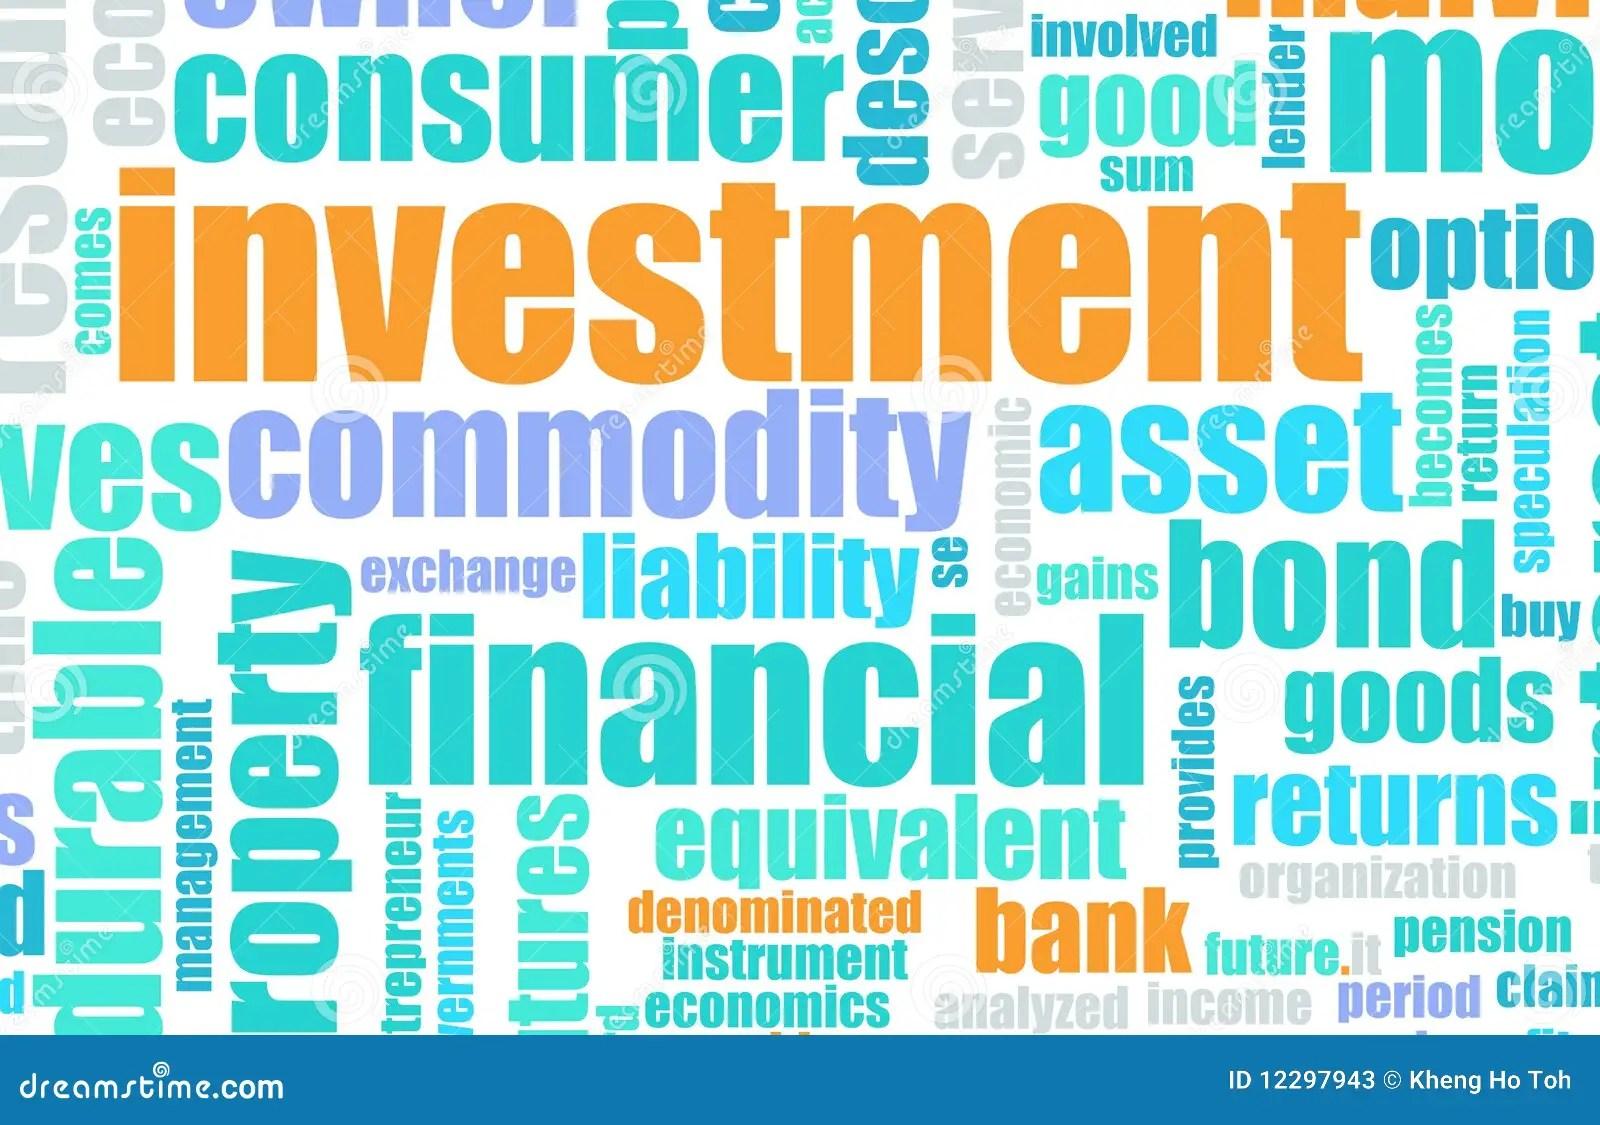 Top binary options brokers 2012